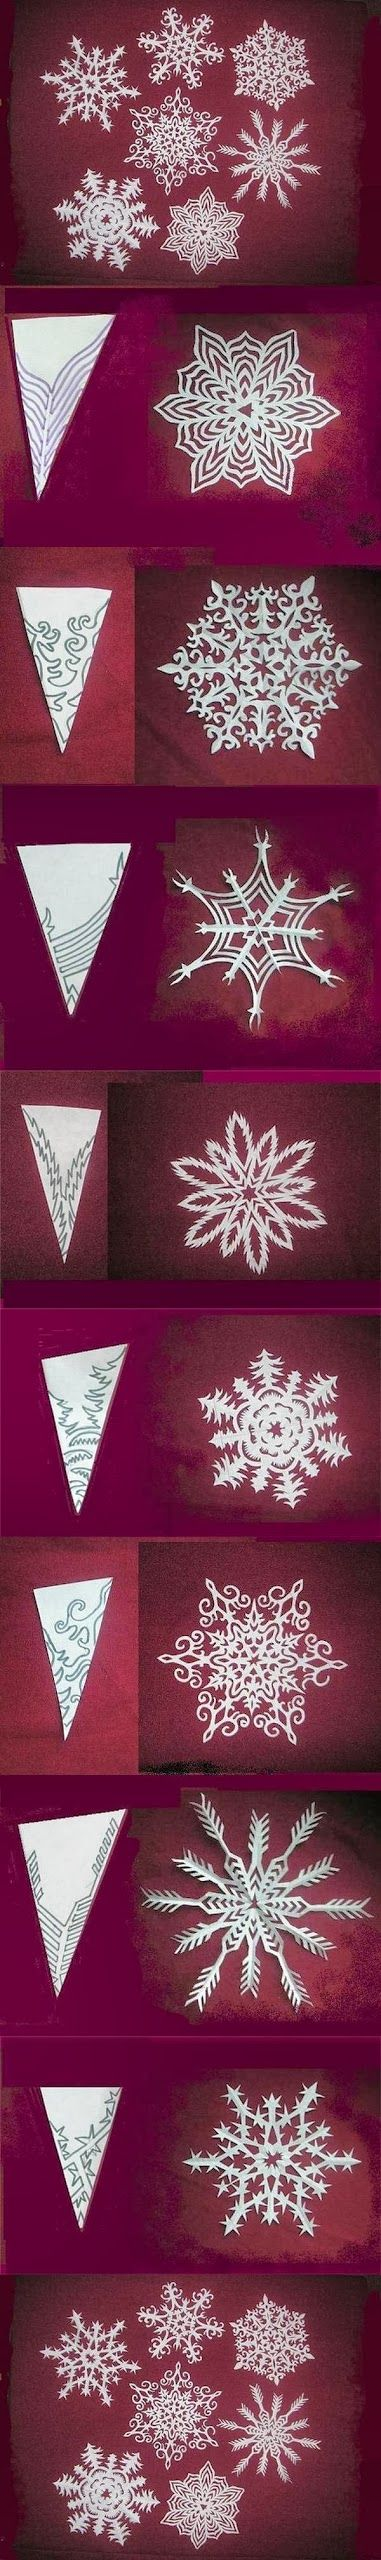 DIY : Snowflakes Paper Pattern Tutorial | DIY & Crafts Tutorials